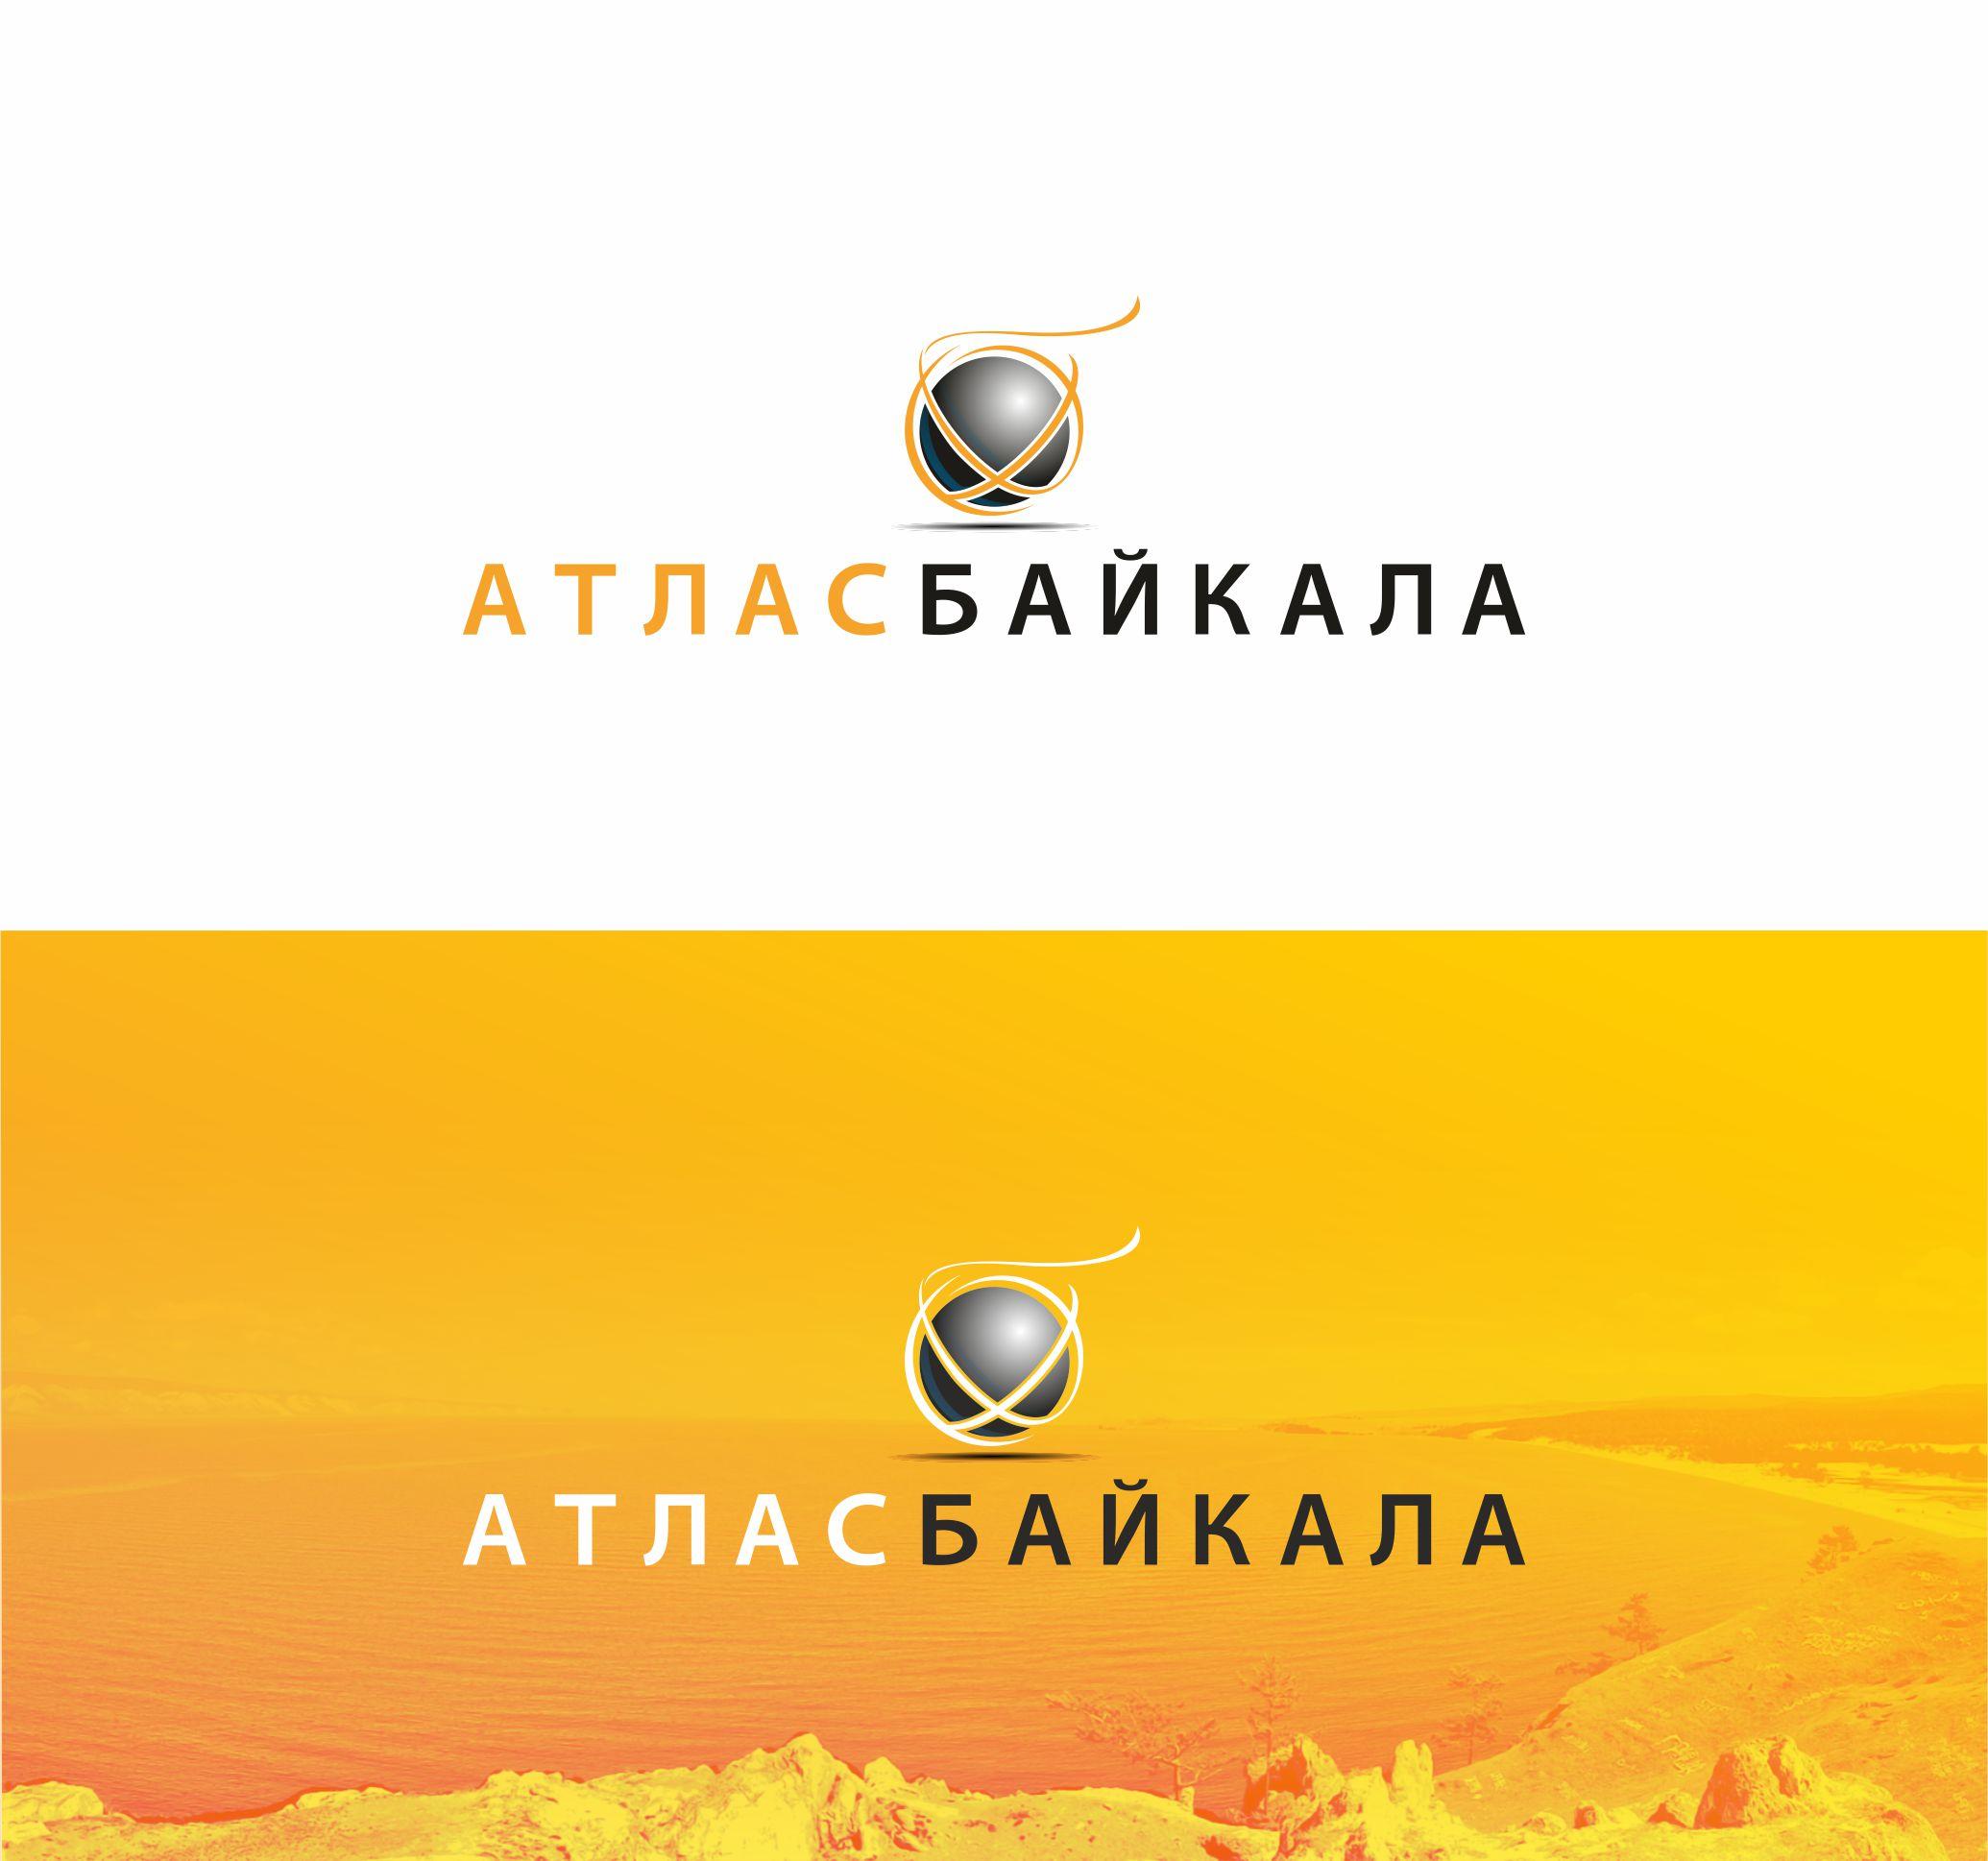 Разработка логотипа Атлас Байкала фото f_6425afc8e4a58bb9.jpg